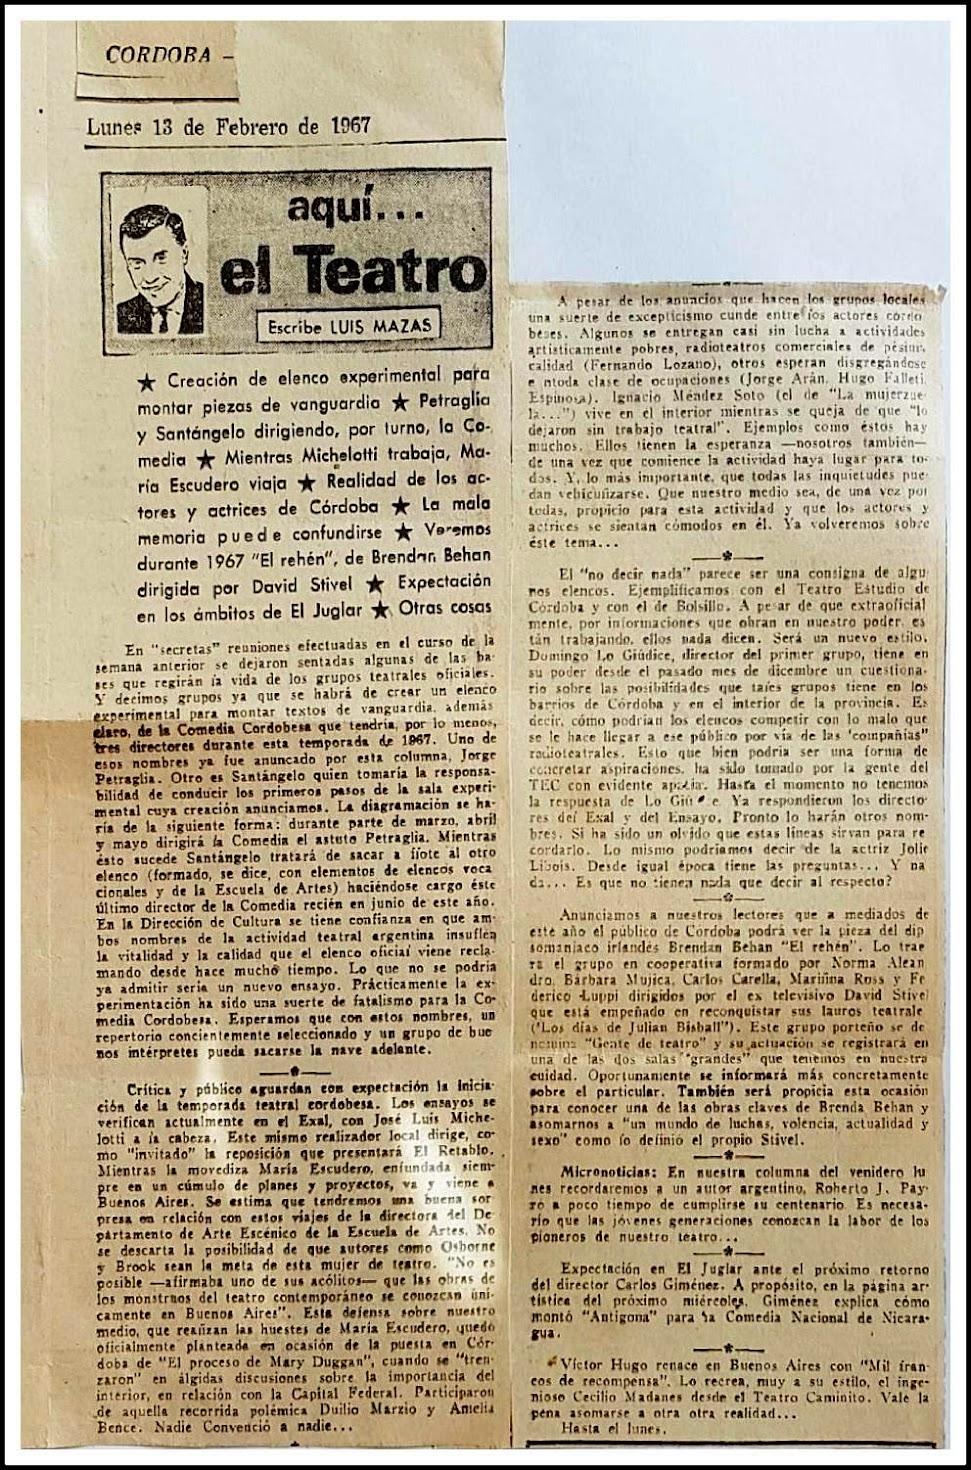 ANTÍGONA, de Anouilh, con la Comedia Nacional de Nicaragua, 1966